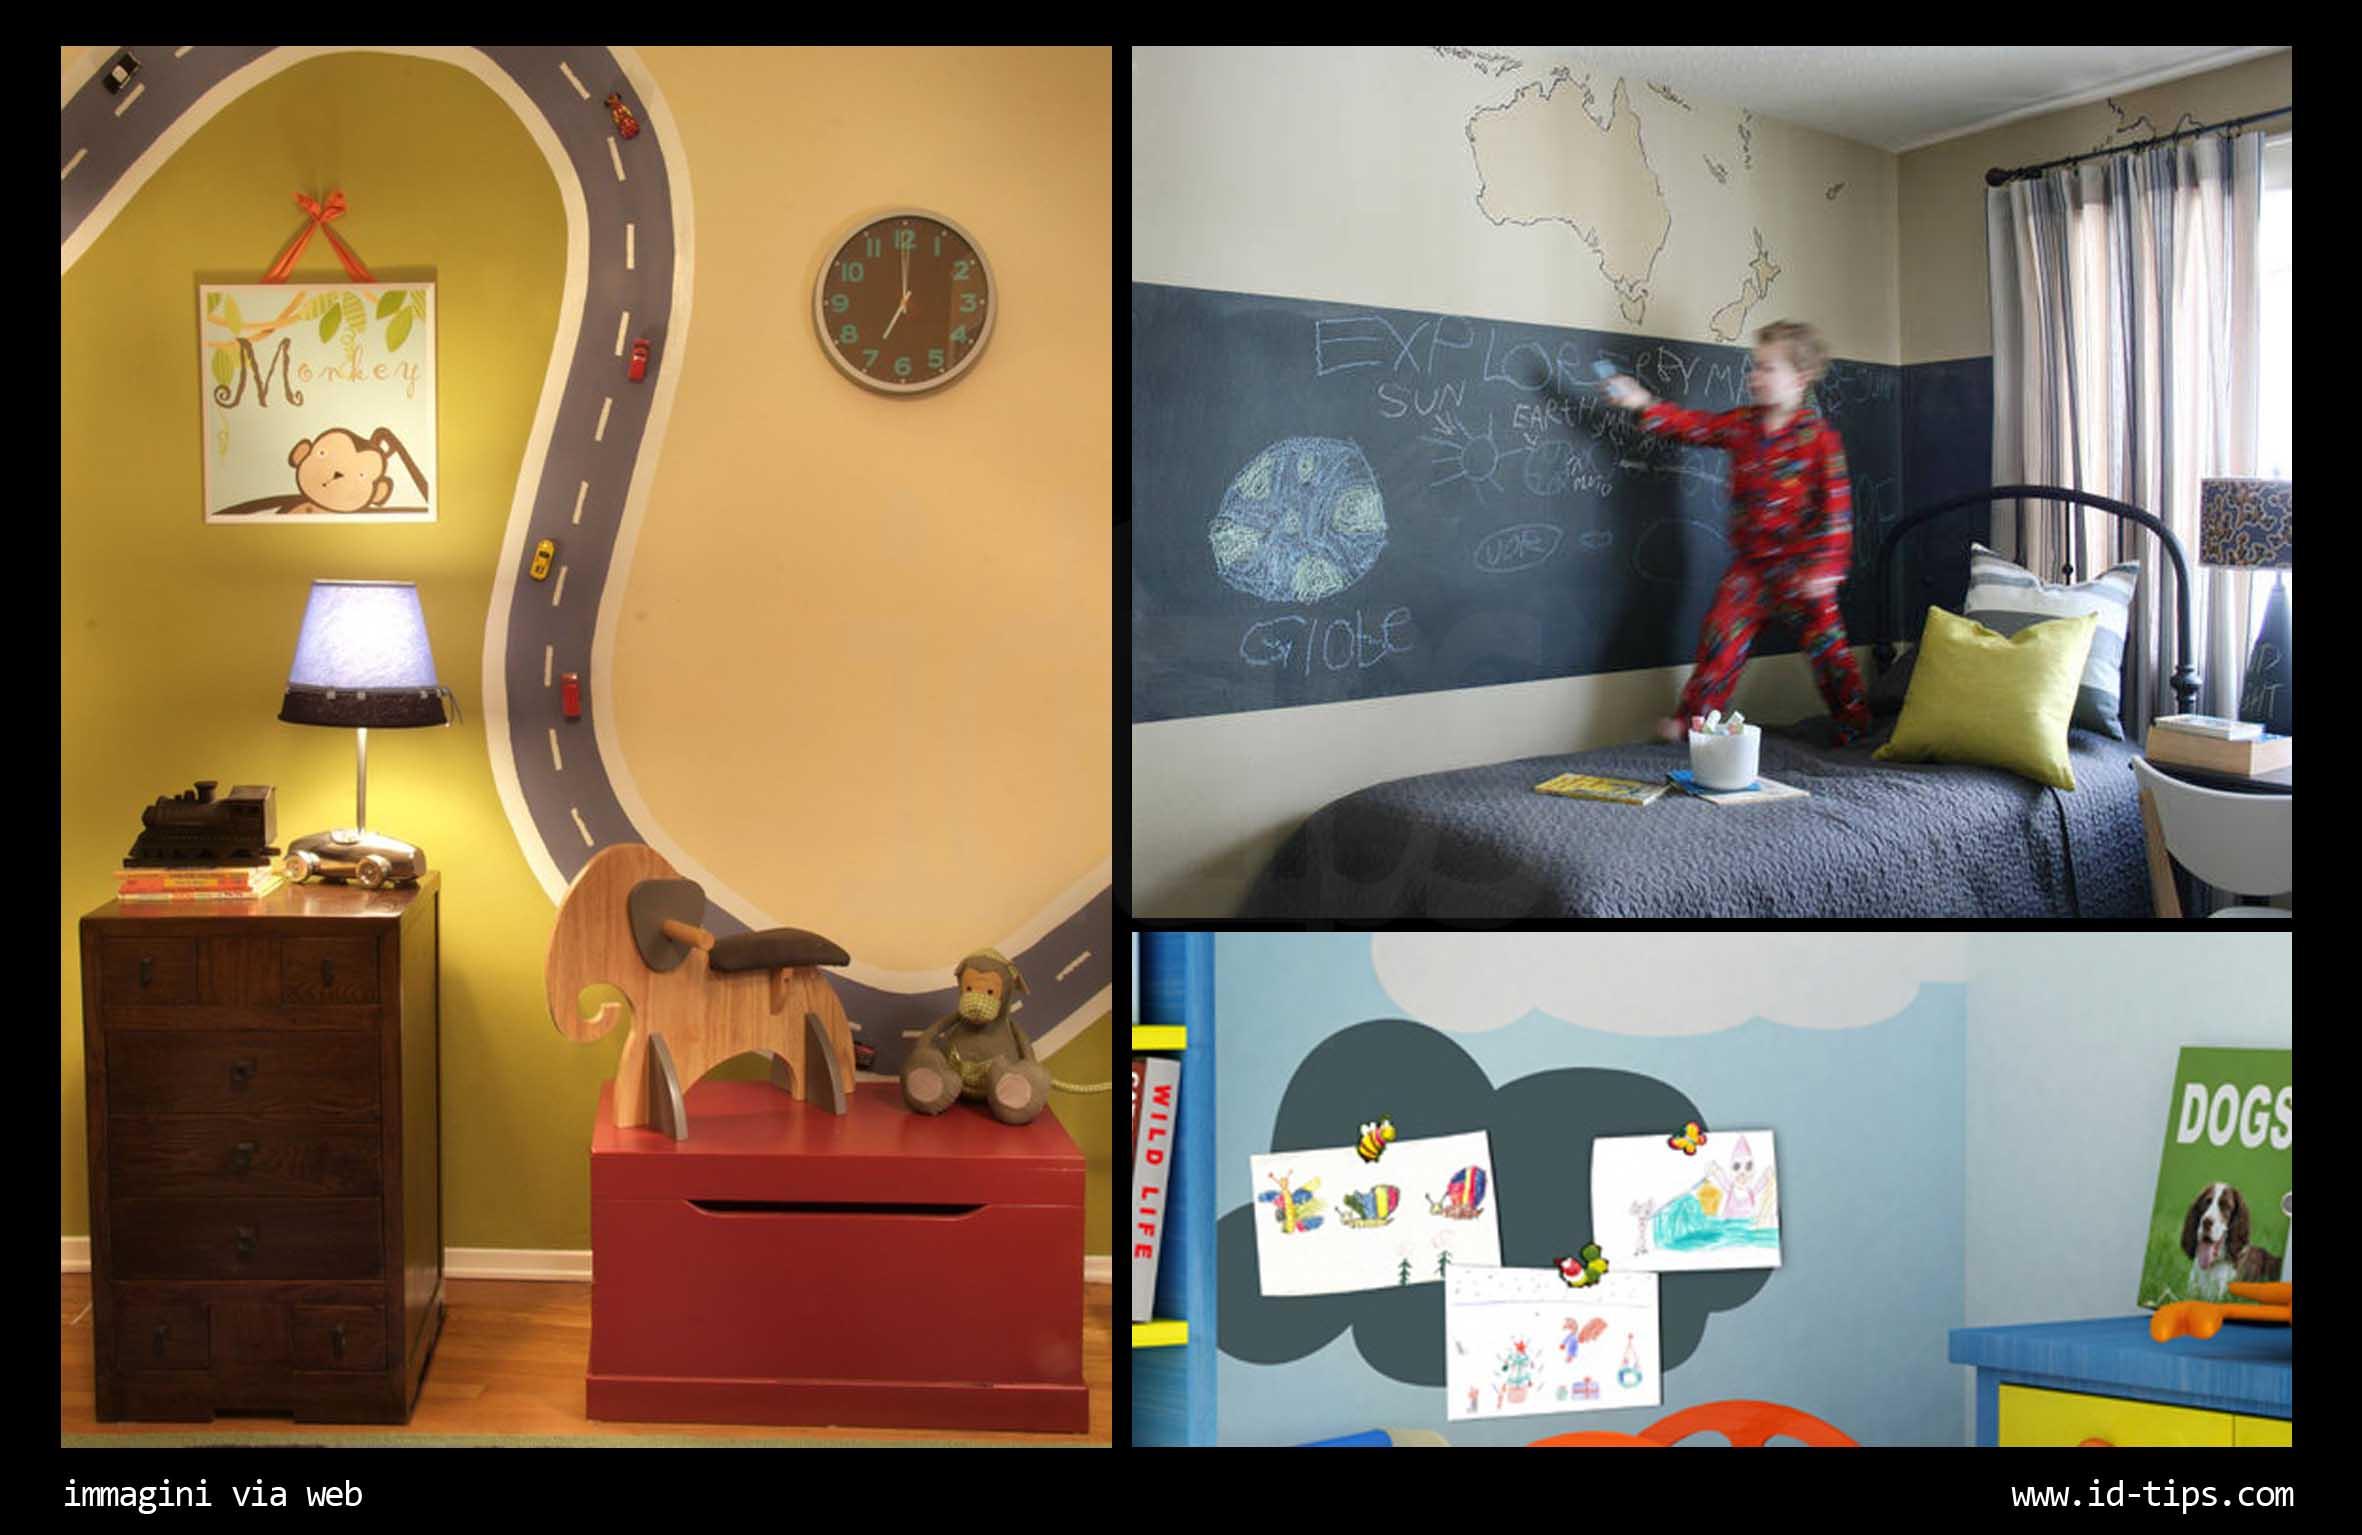 Colori muri camerette bambini idee per dipingere - Decorazioni camera bimbi ...